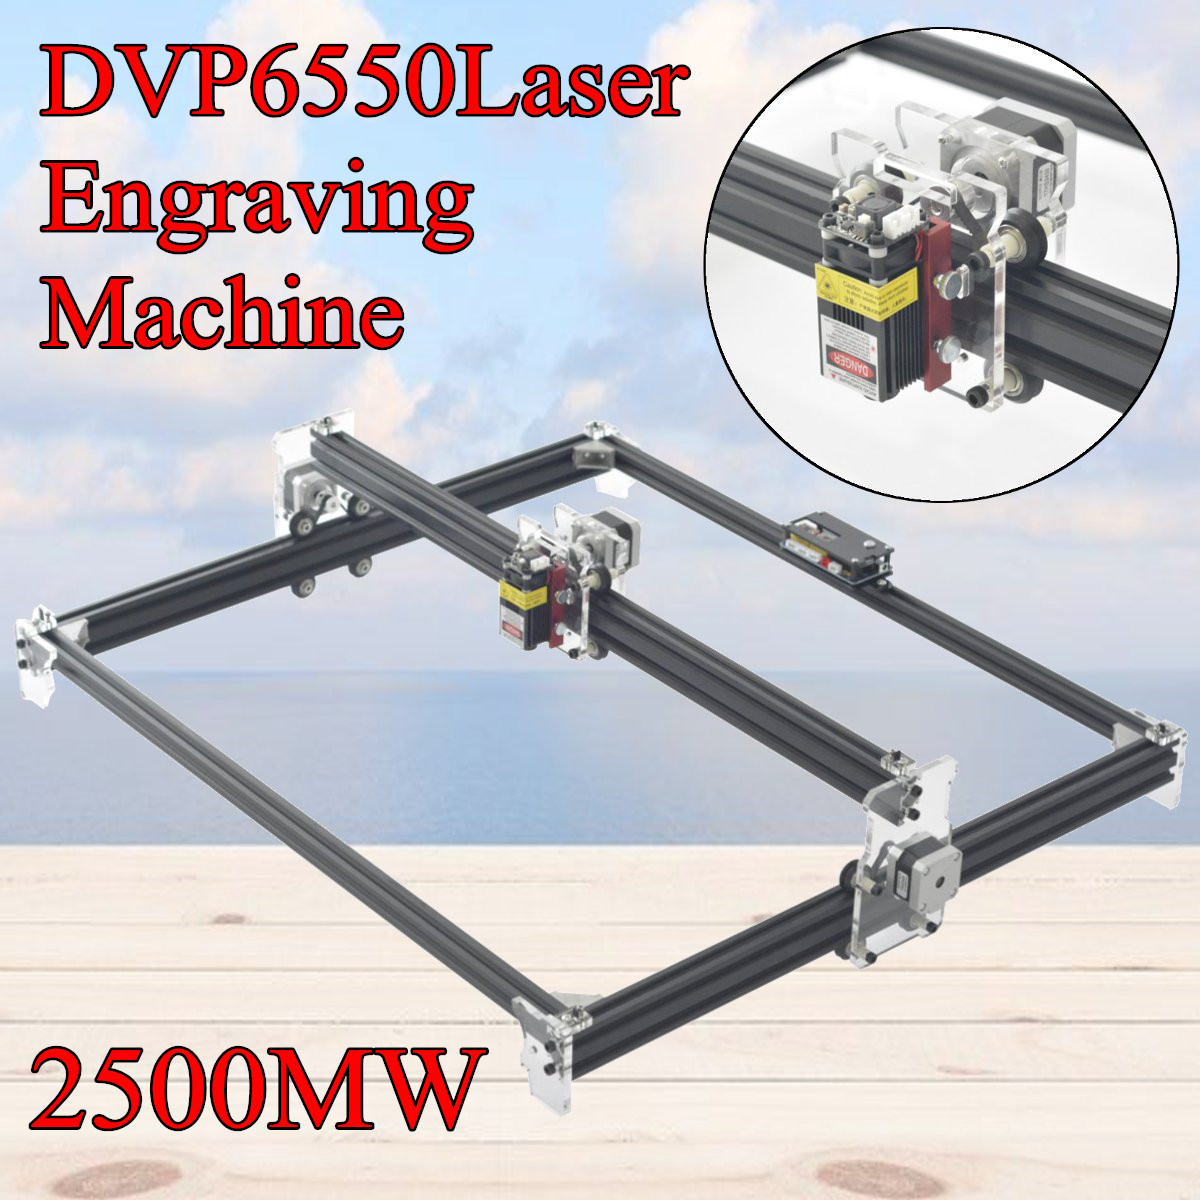 2500MW 65x50cm Laser Engraving Machine Cutting Printer CNC Control LOGO Router CNC Router Best Advanced toys